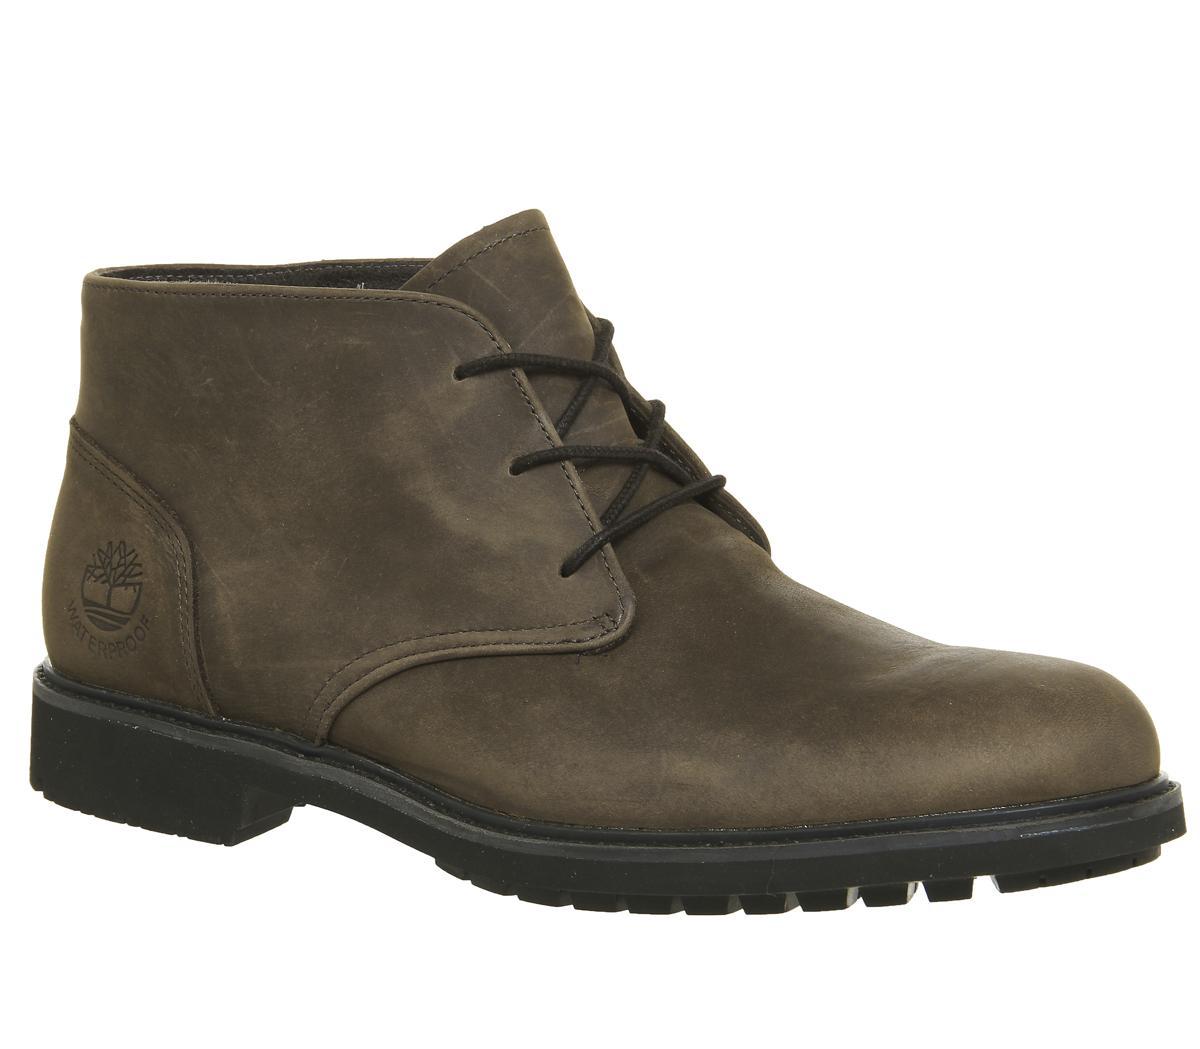 Timberland Stormbuck Chukka Boots Dark